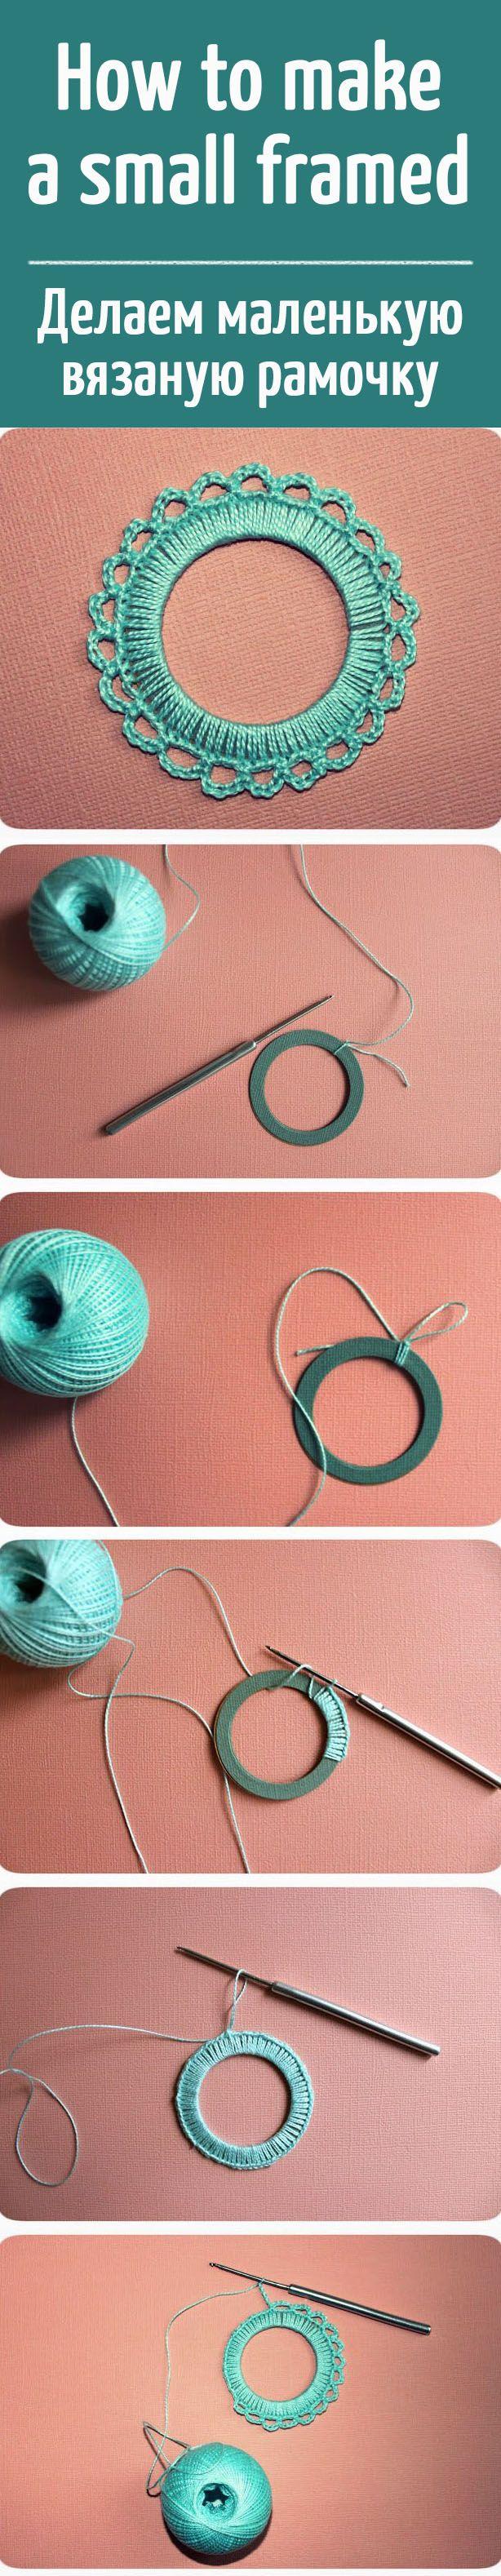 Делаем маленькую вязаную рамочку своими руками / How to make a small framed #miniature #миниатюра #DIY #сделайсам #МК #мастеркласс #ручнаяработа #handmade #tutorial